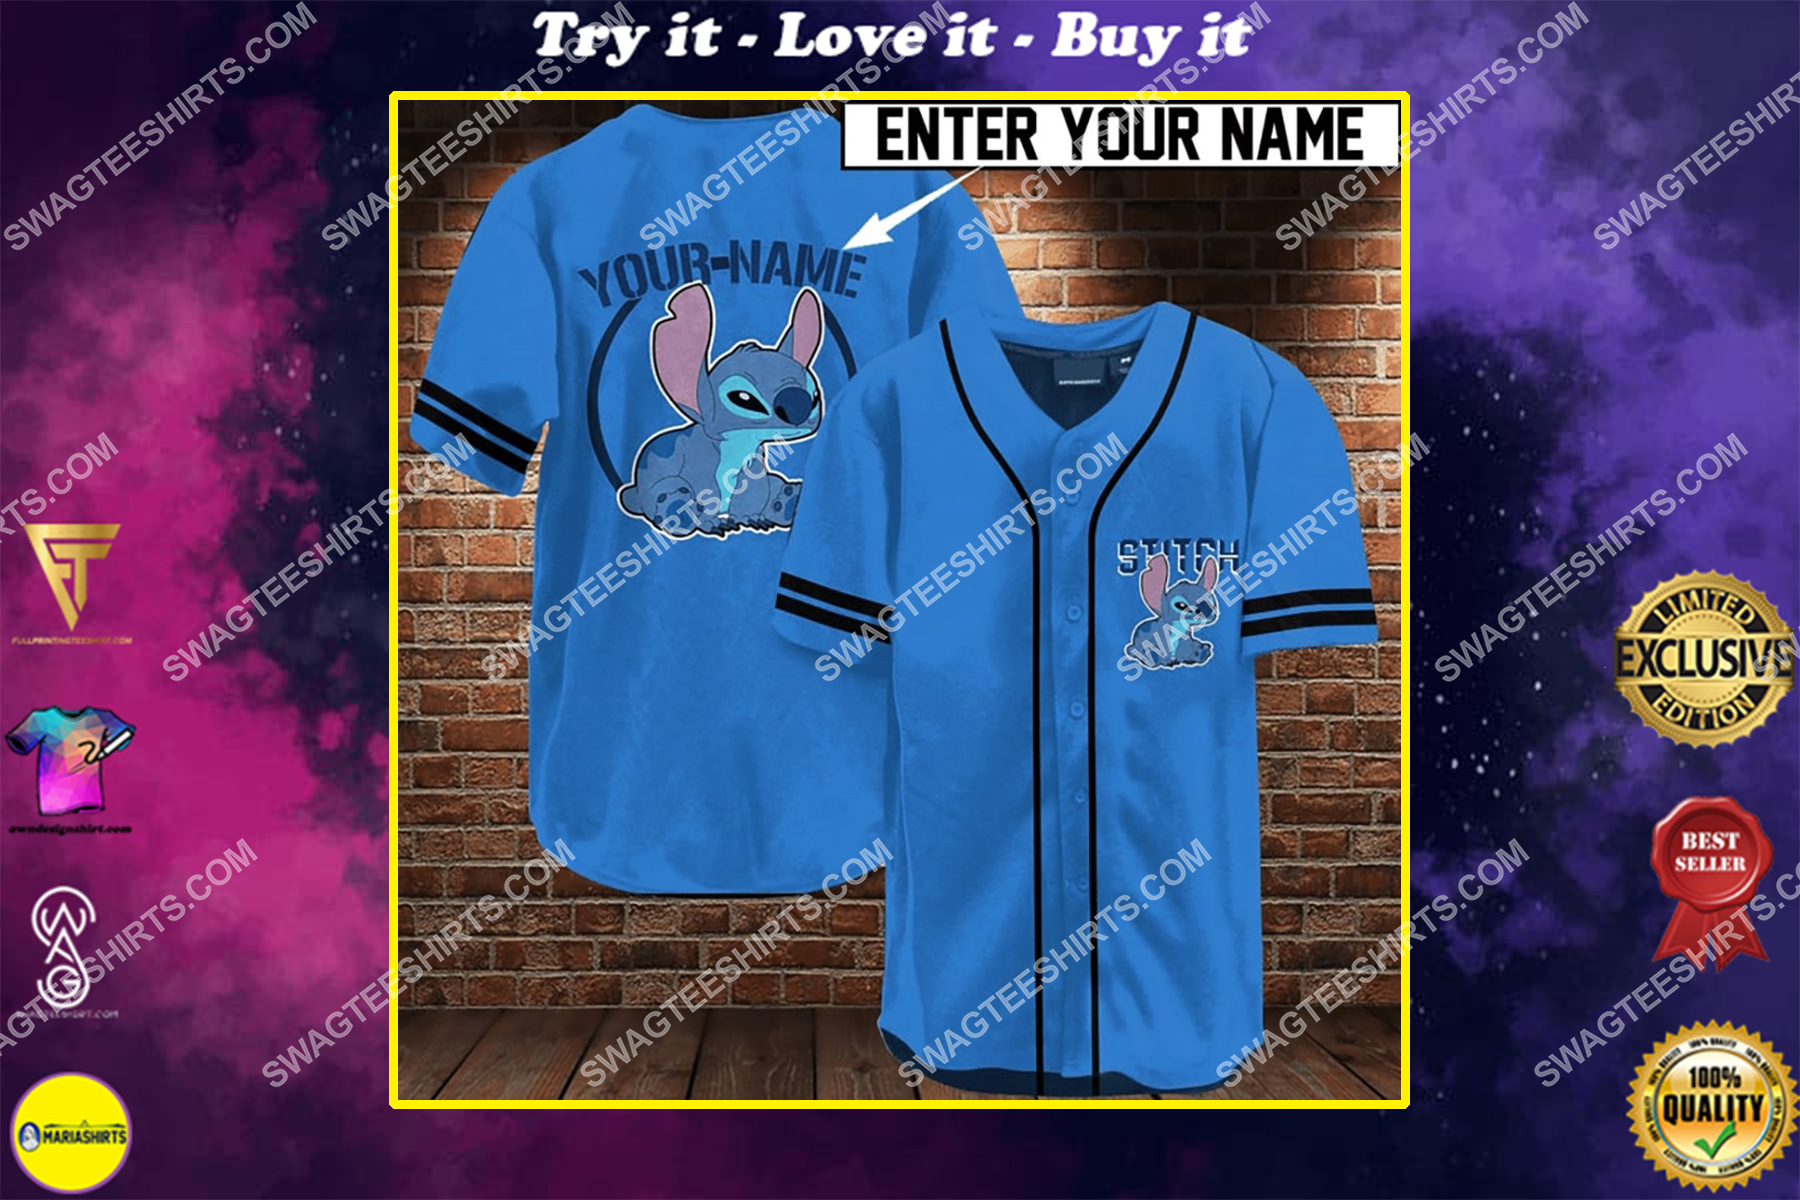 custom name stitch full printing baseball shirt